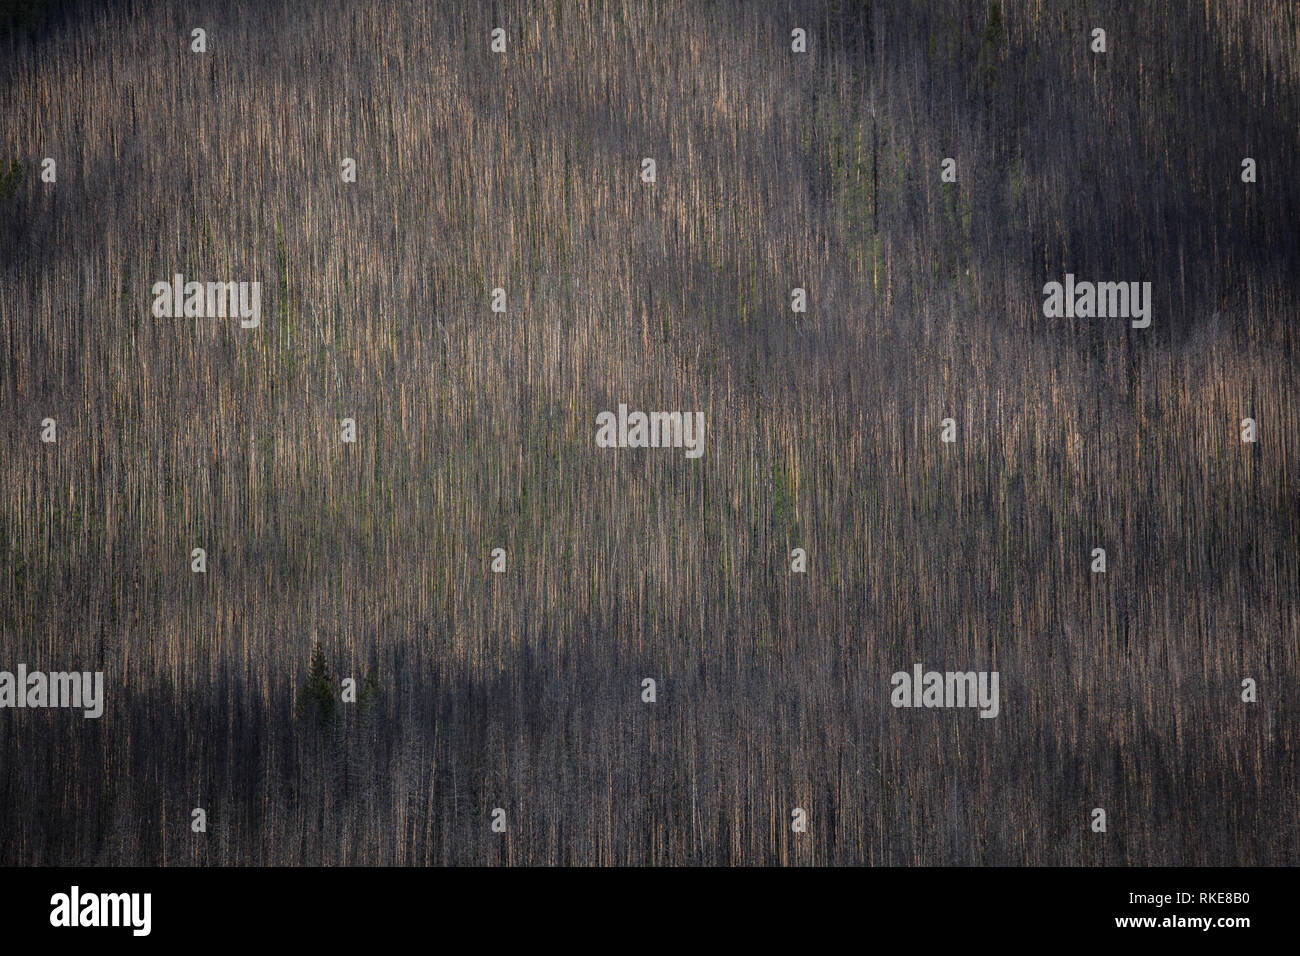 Yoho National Park, Rockies, British Columbia, Canada - Stock Image